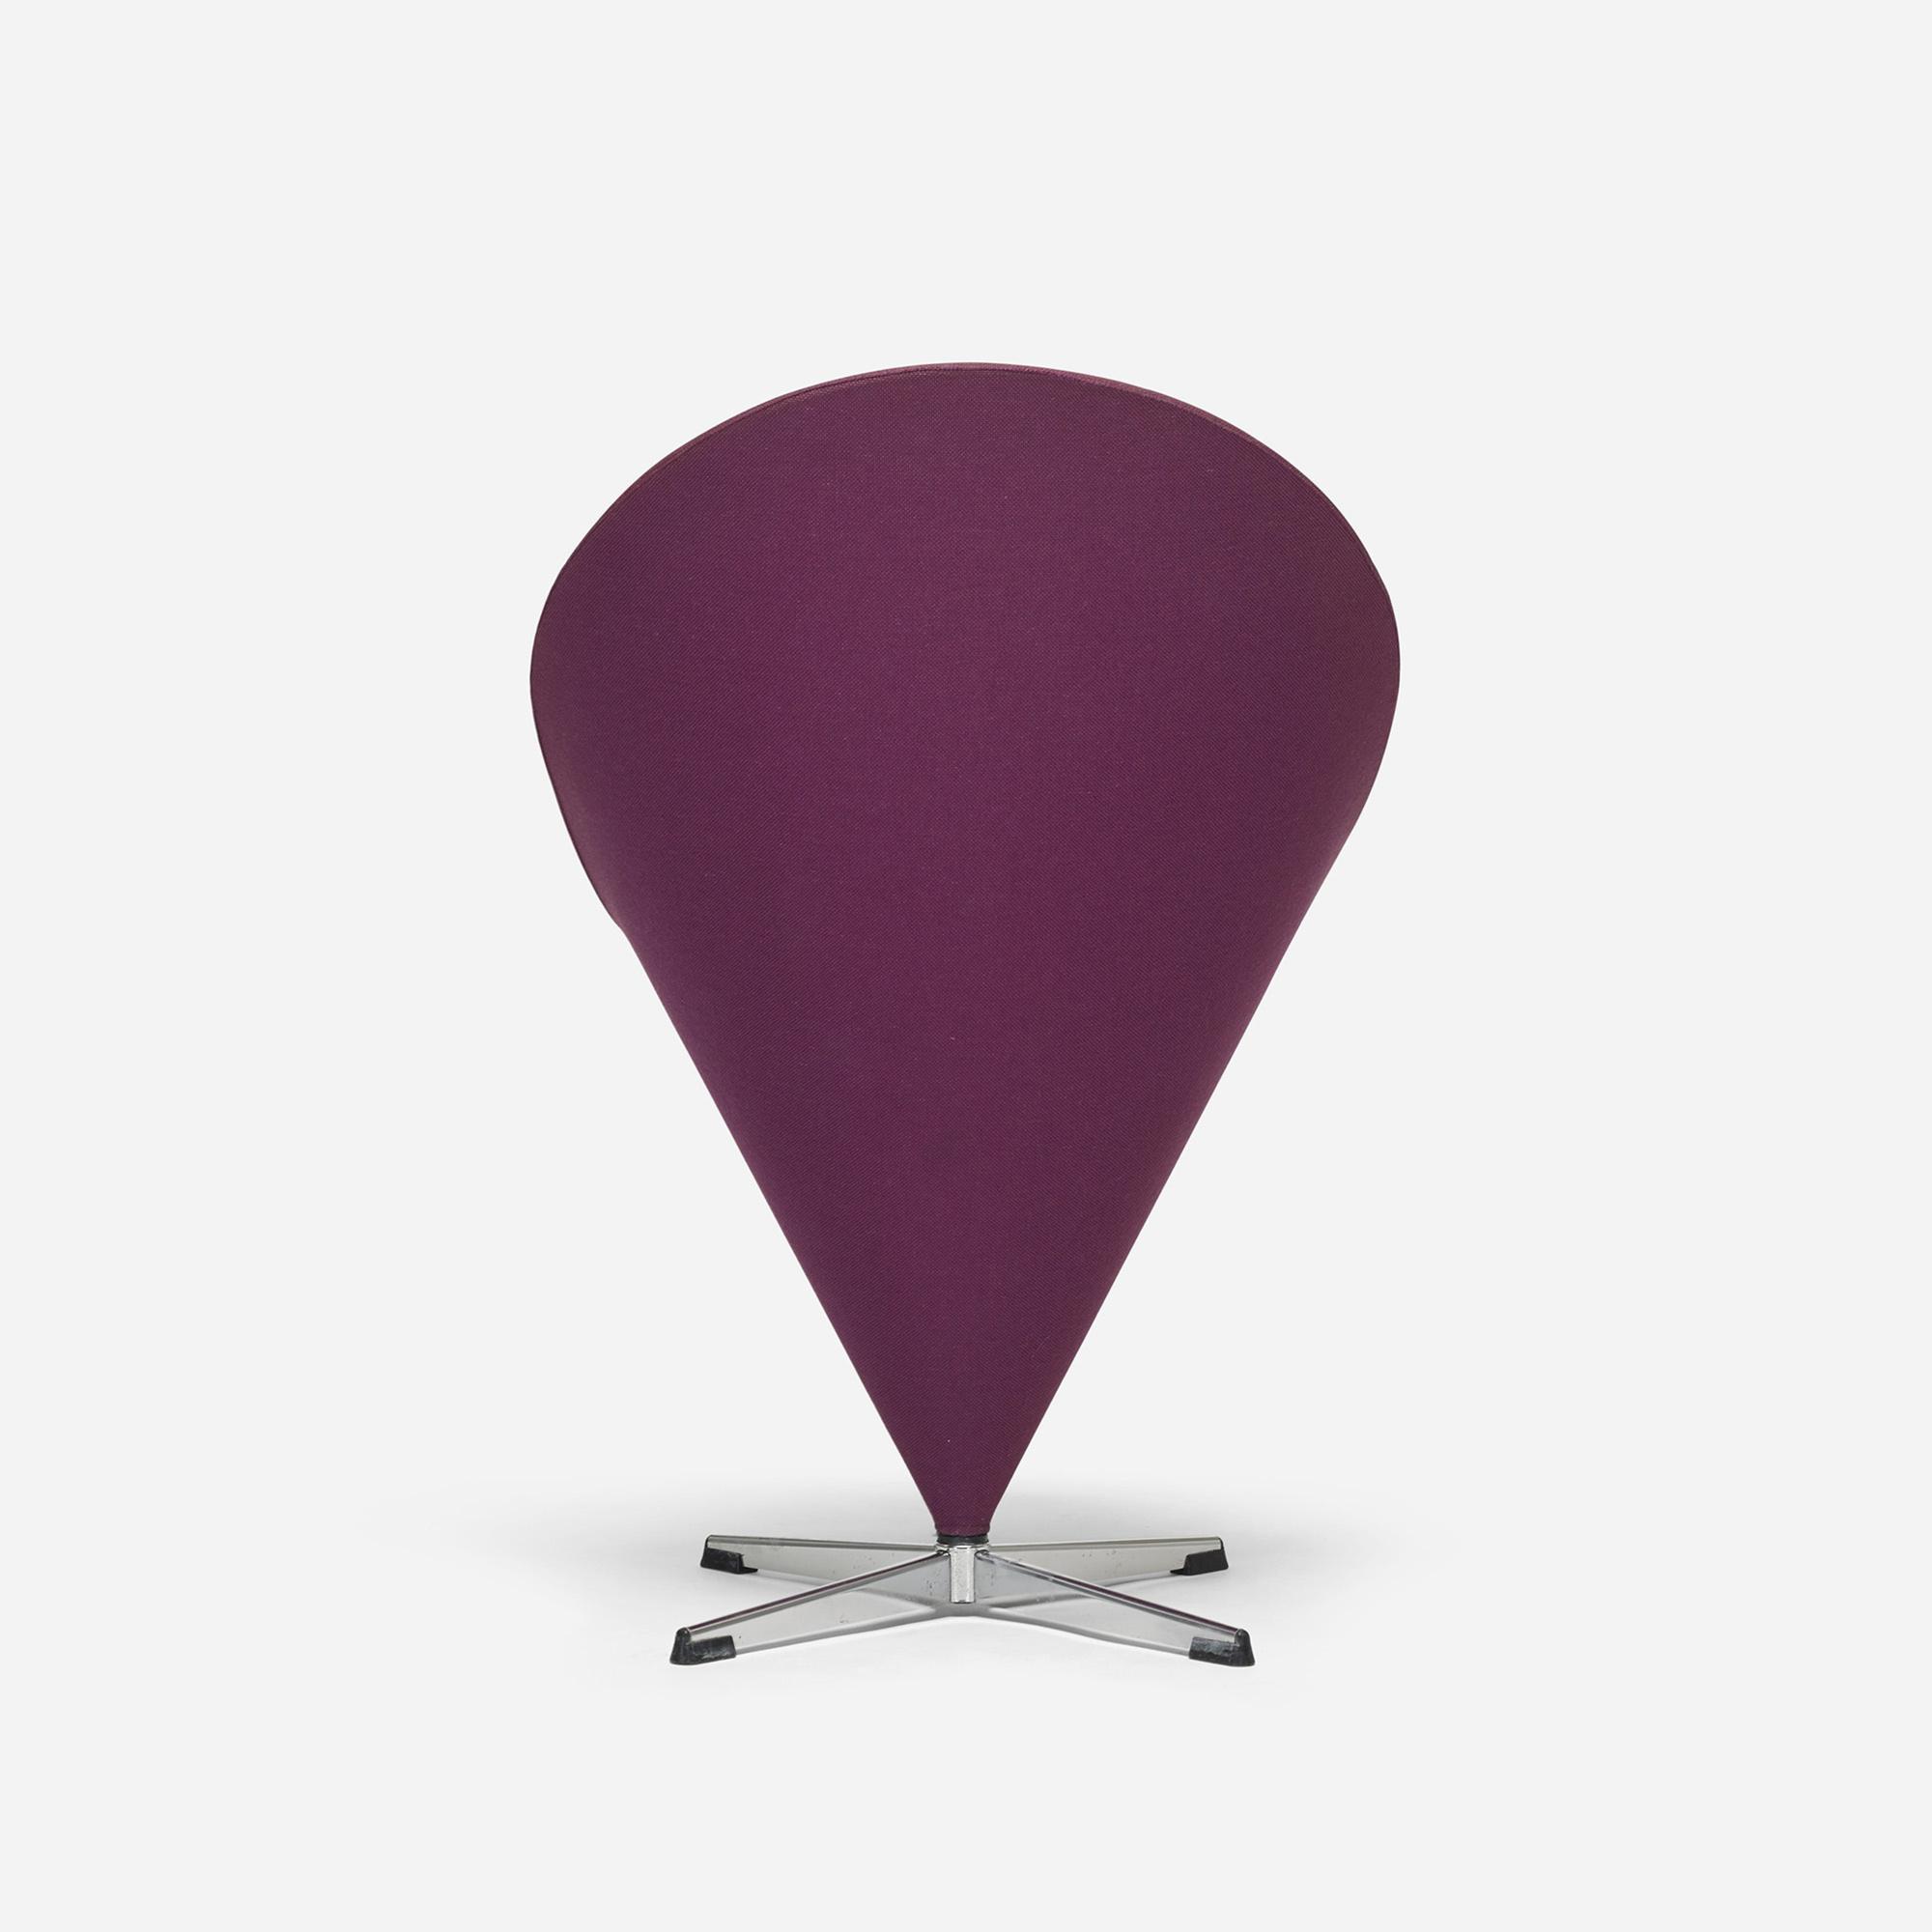 648: Verner Panton / Cone chair (3 of 4)